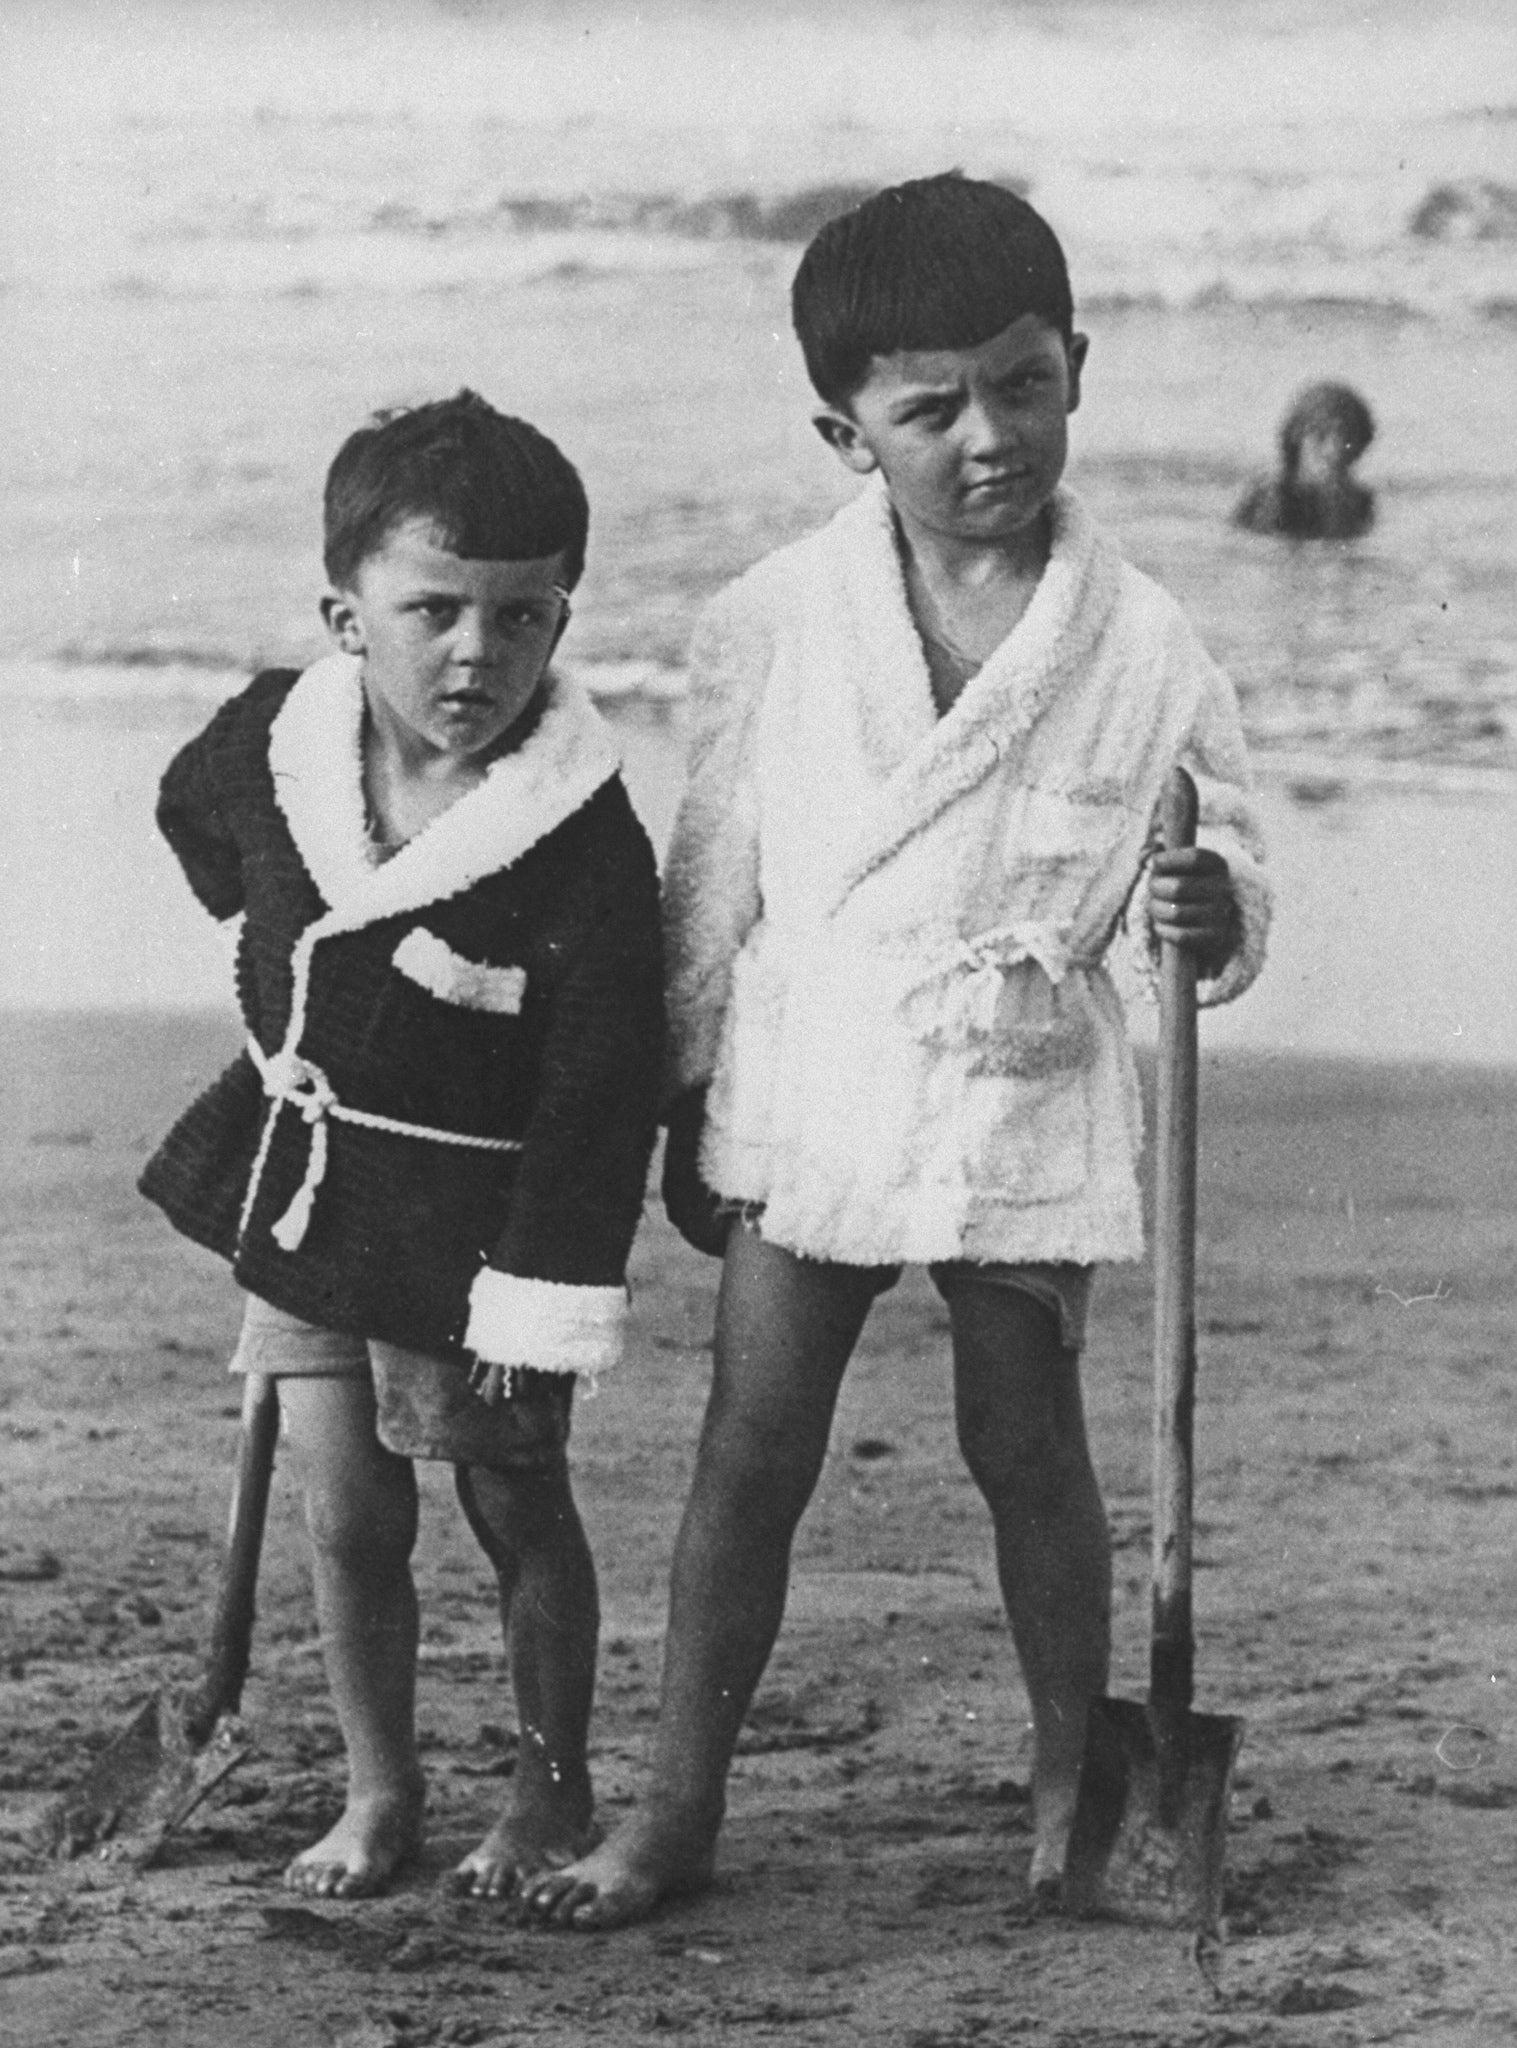 Fellini and his brother, 1920s, Rimini, Italy